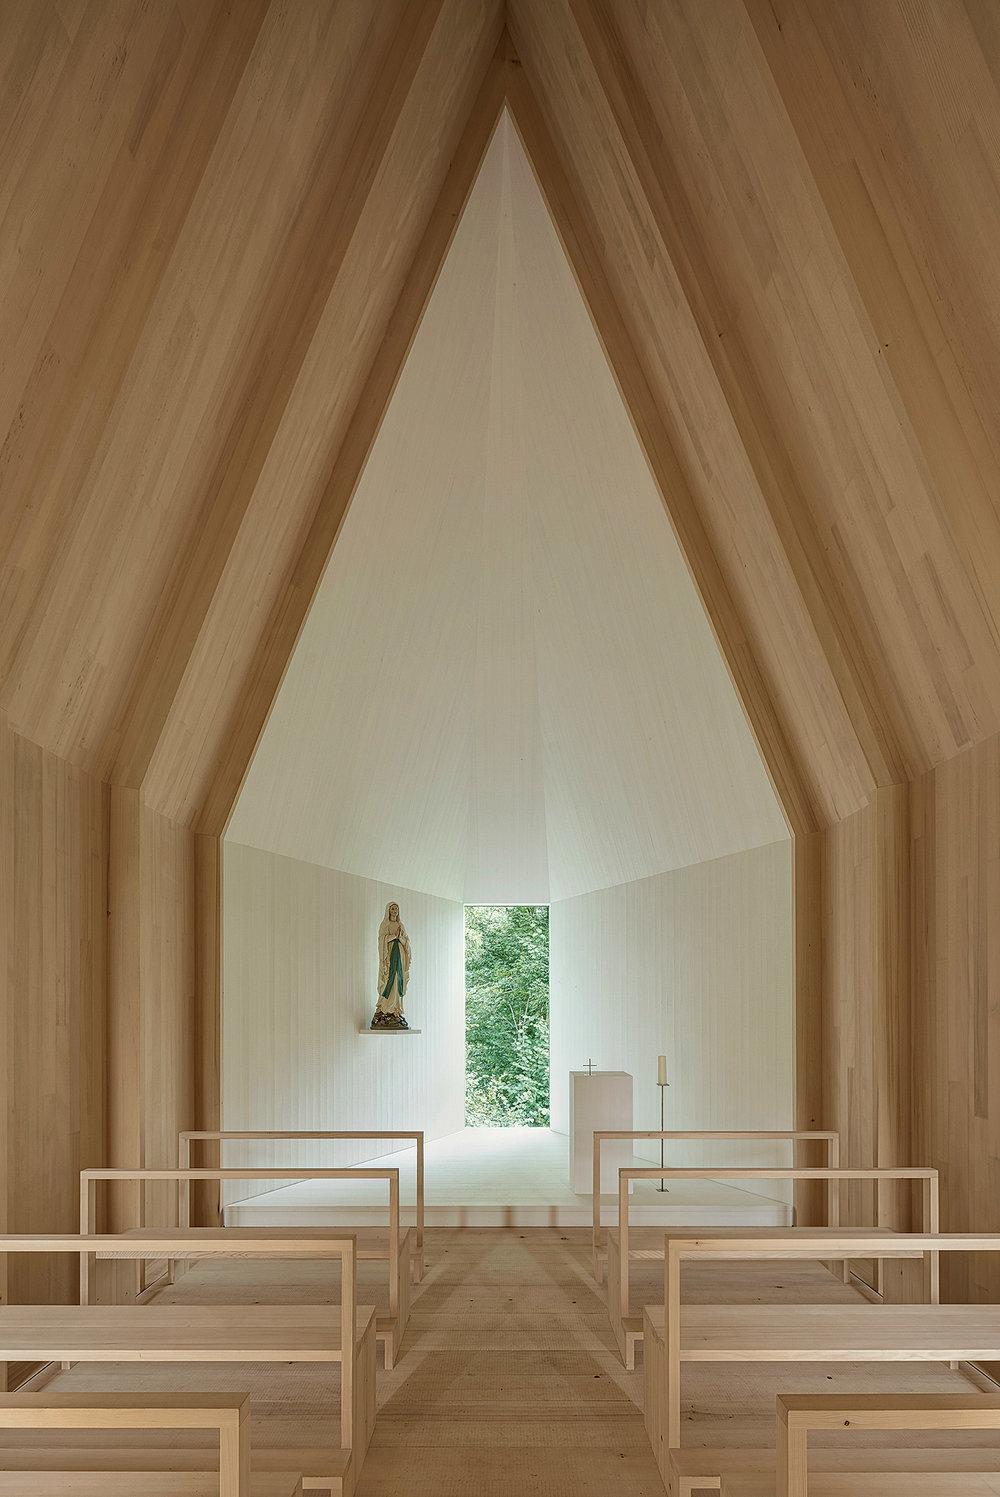 kapelle-salgenreute-bernardo-bader-krumbach-architecture-cultural-chapel-germany_dezeen_2364_col_6.jpg